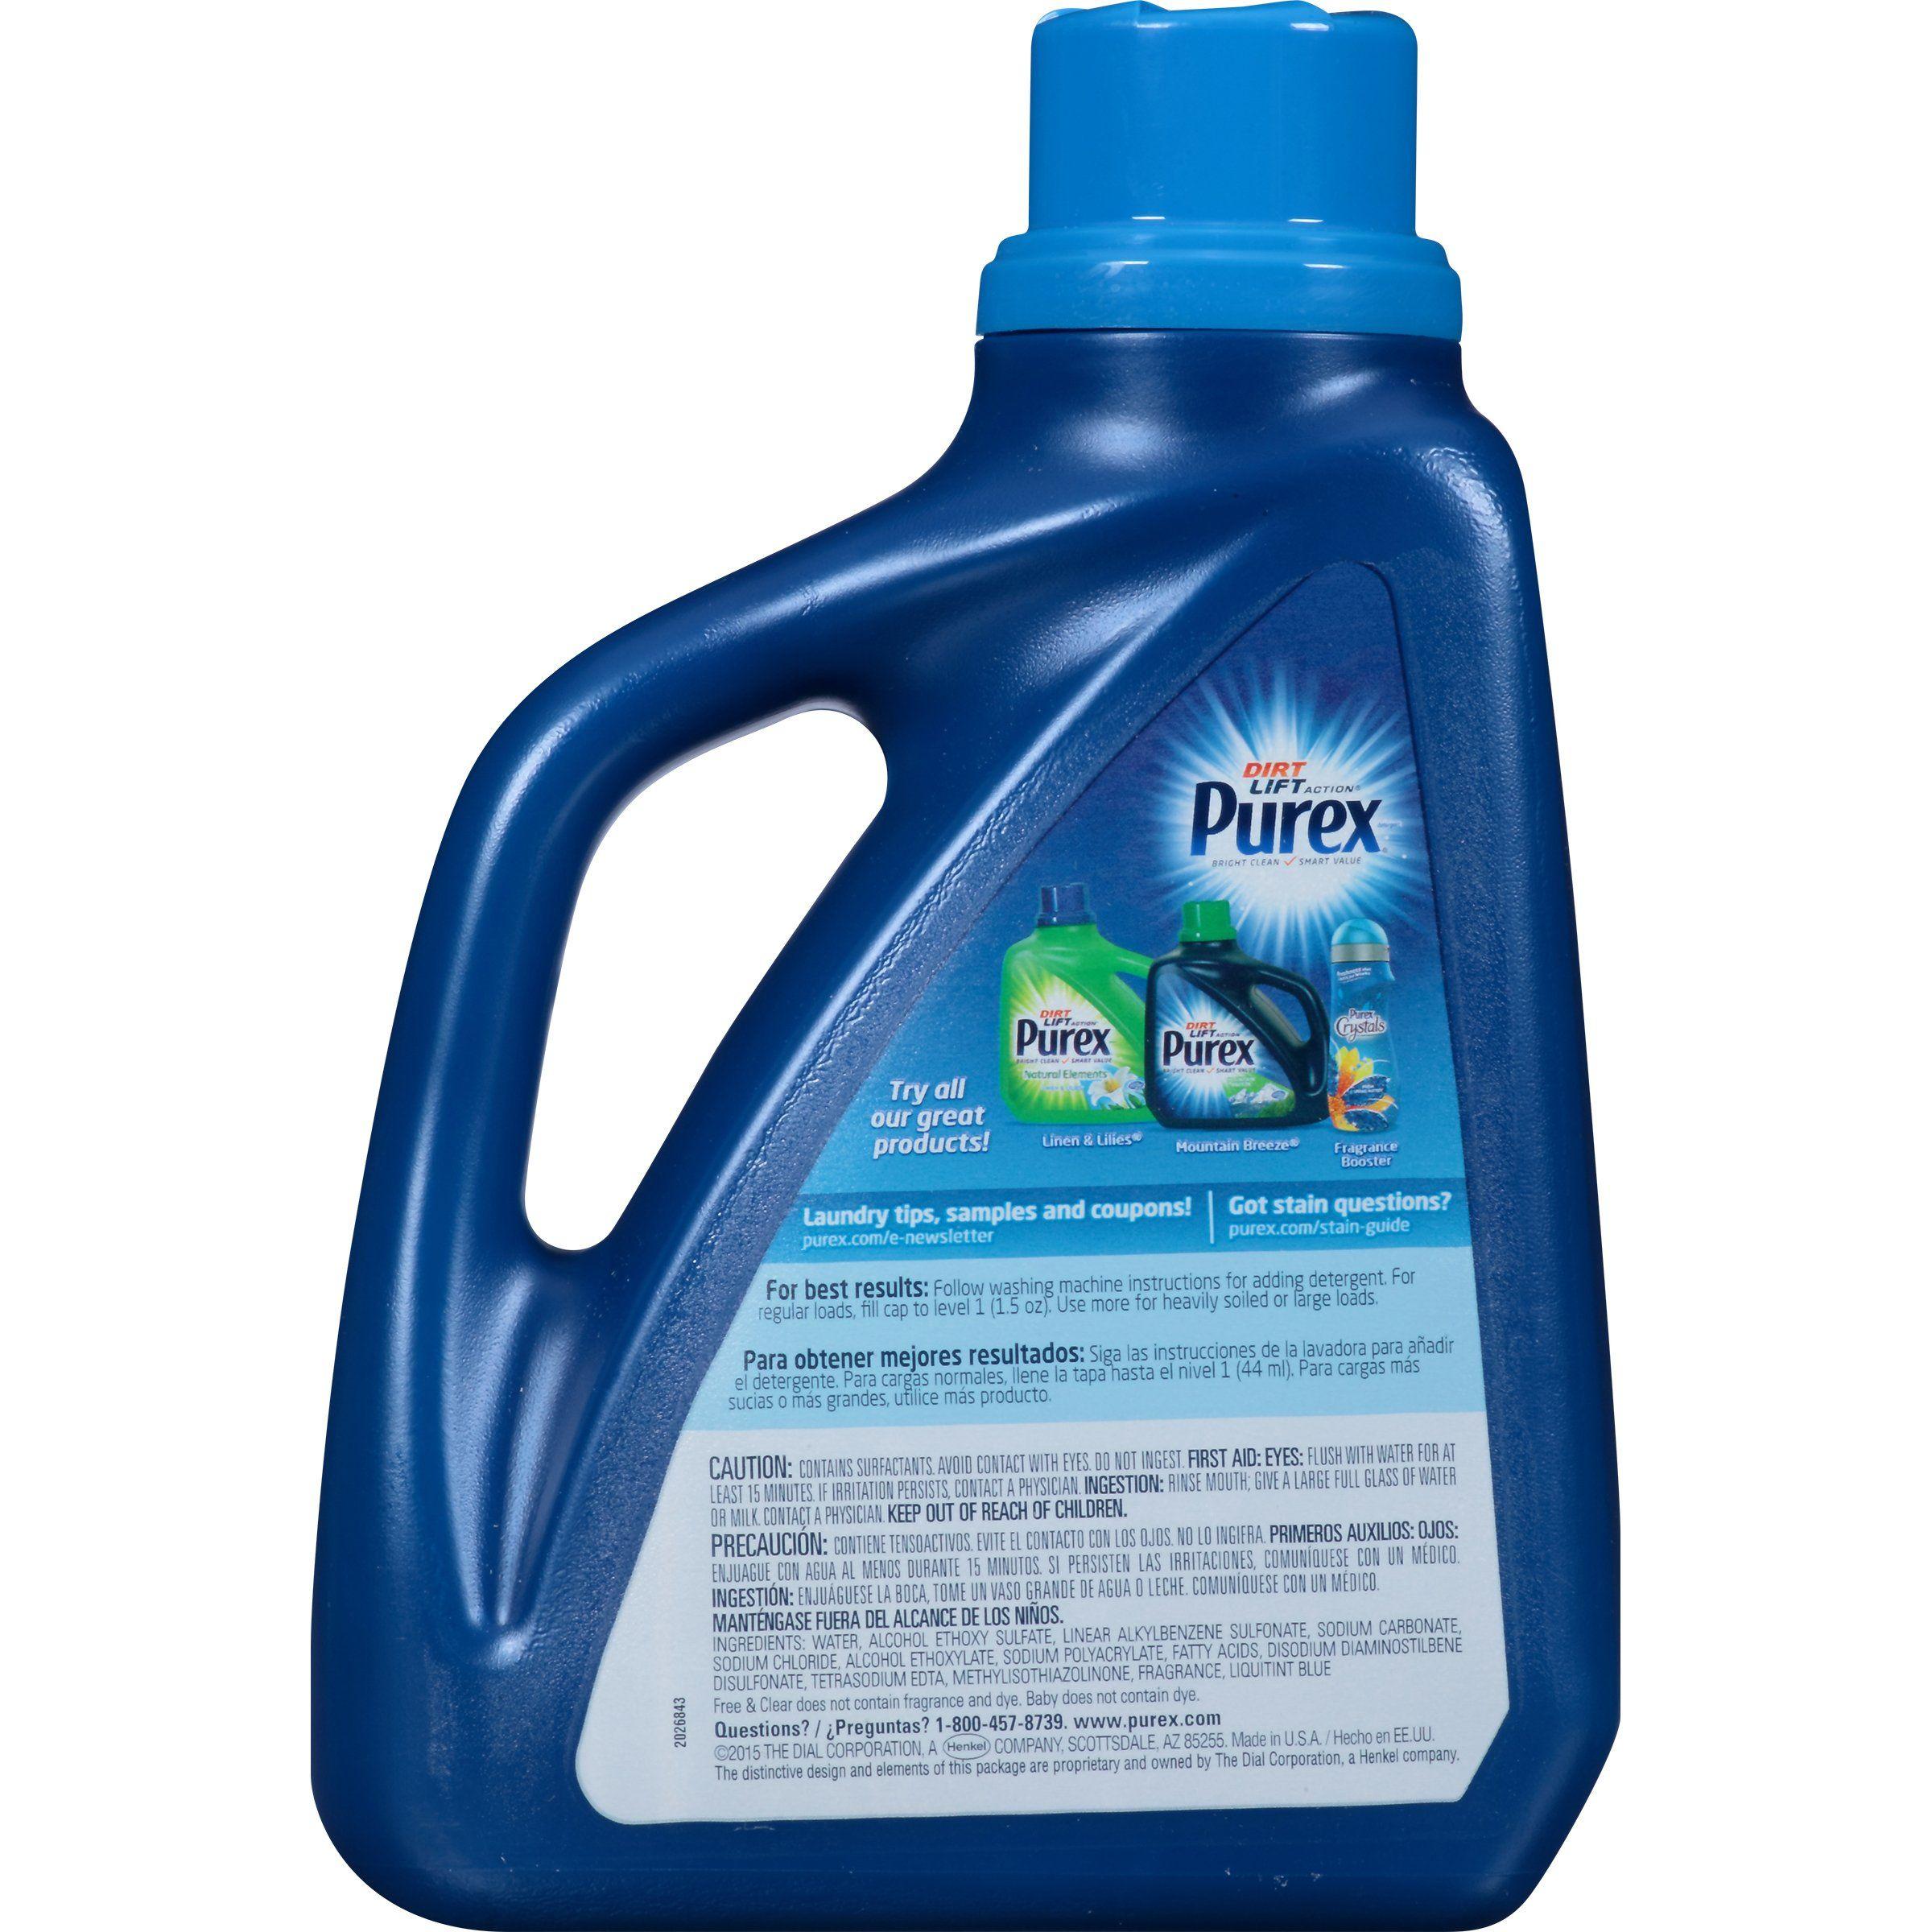 Purex Liquid Laundry Detergent With Crystals Fragrance Fresh